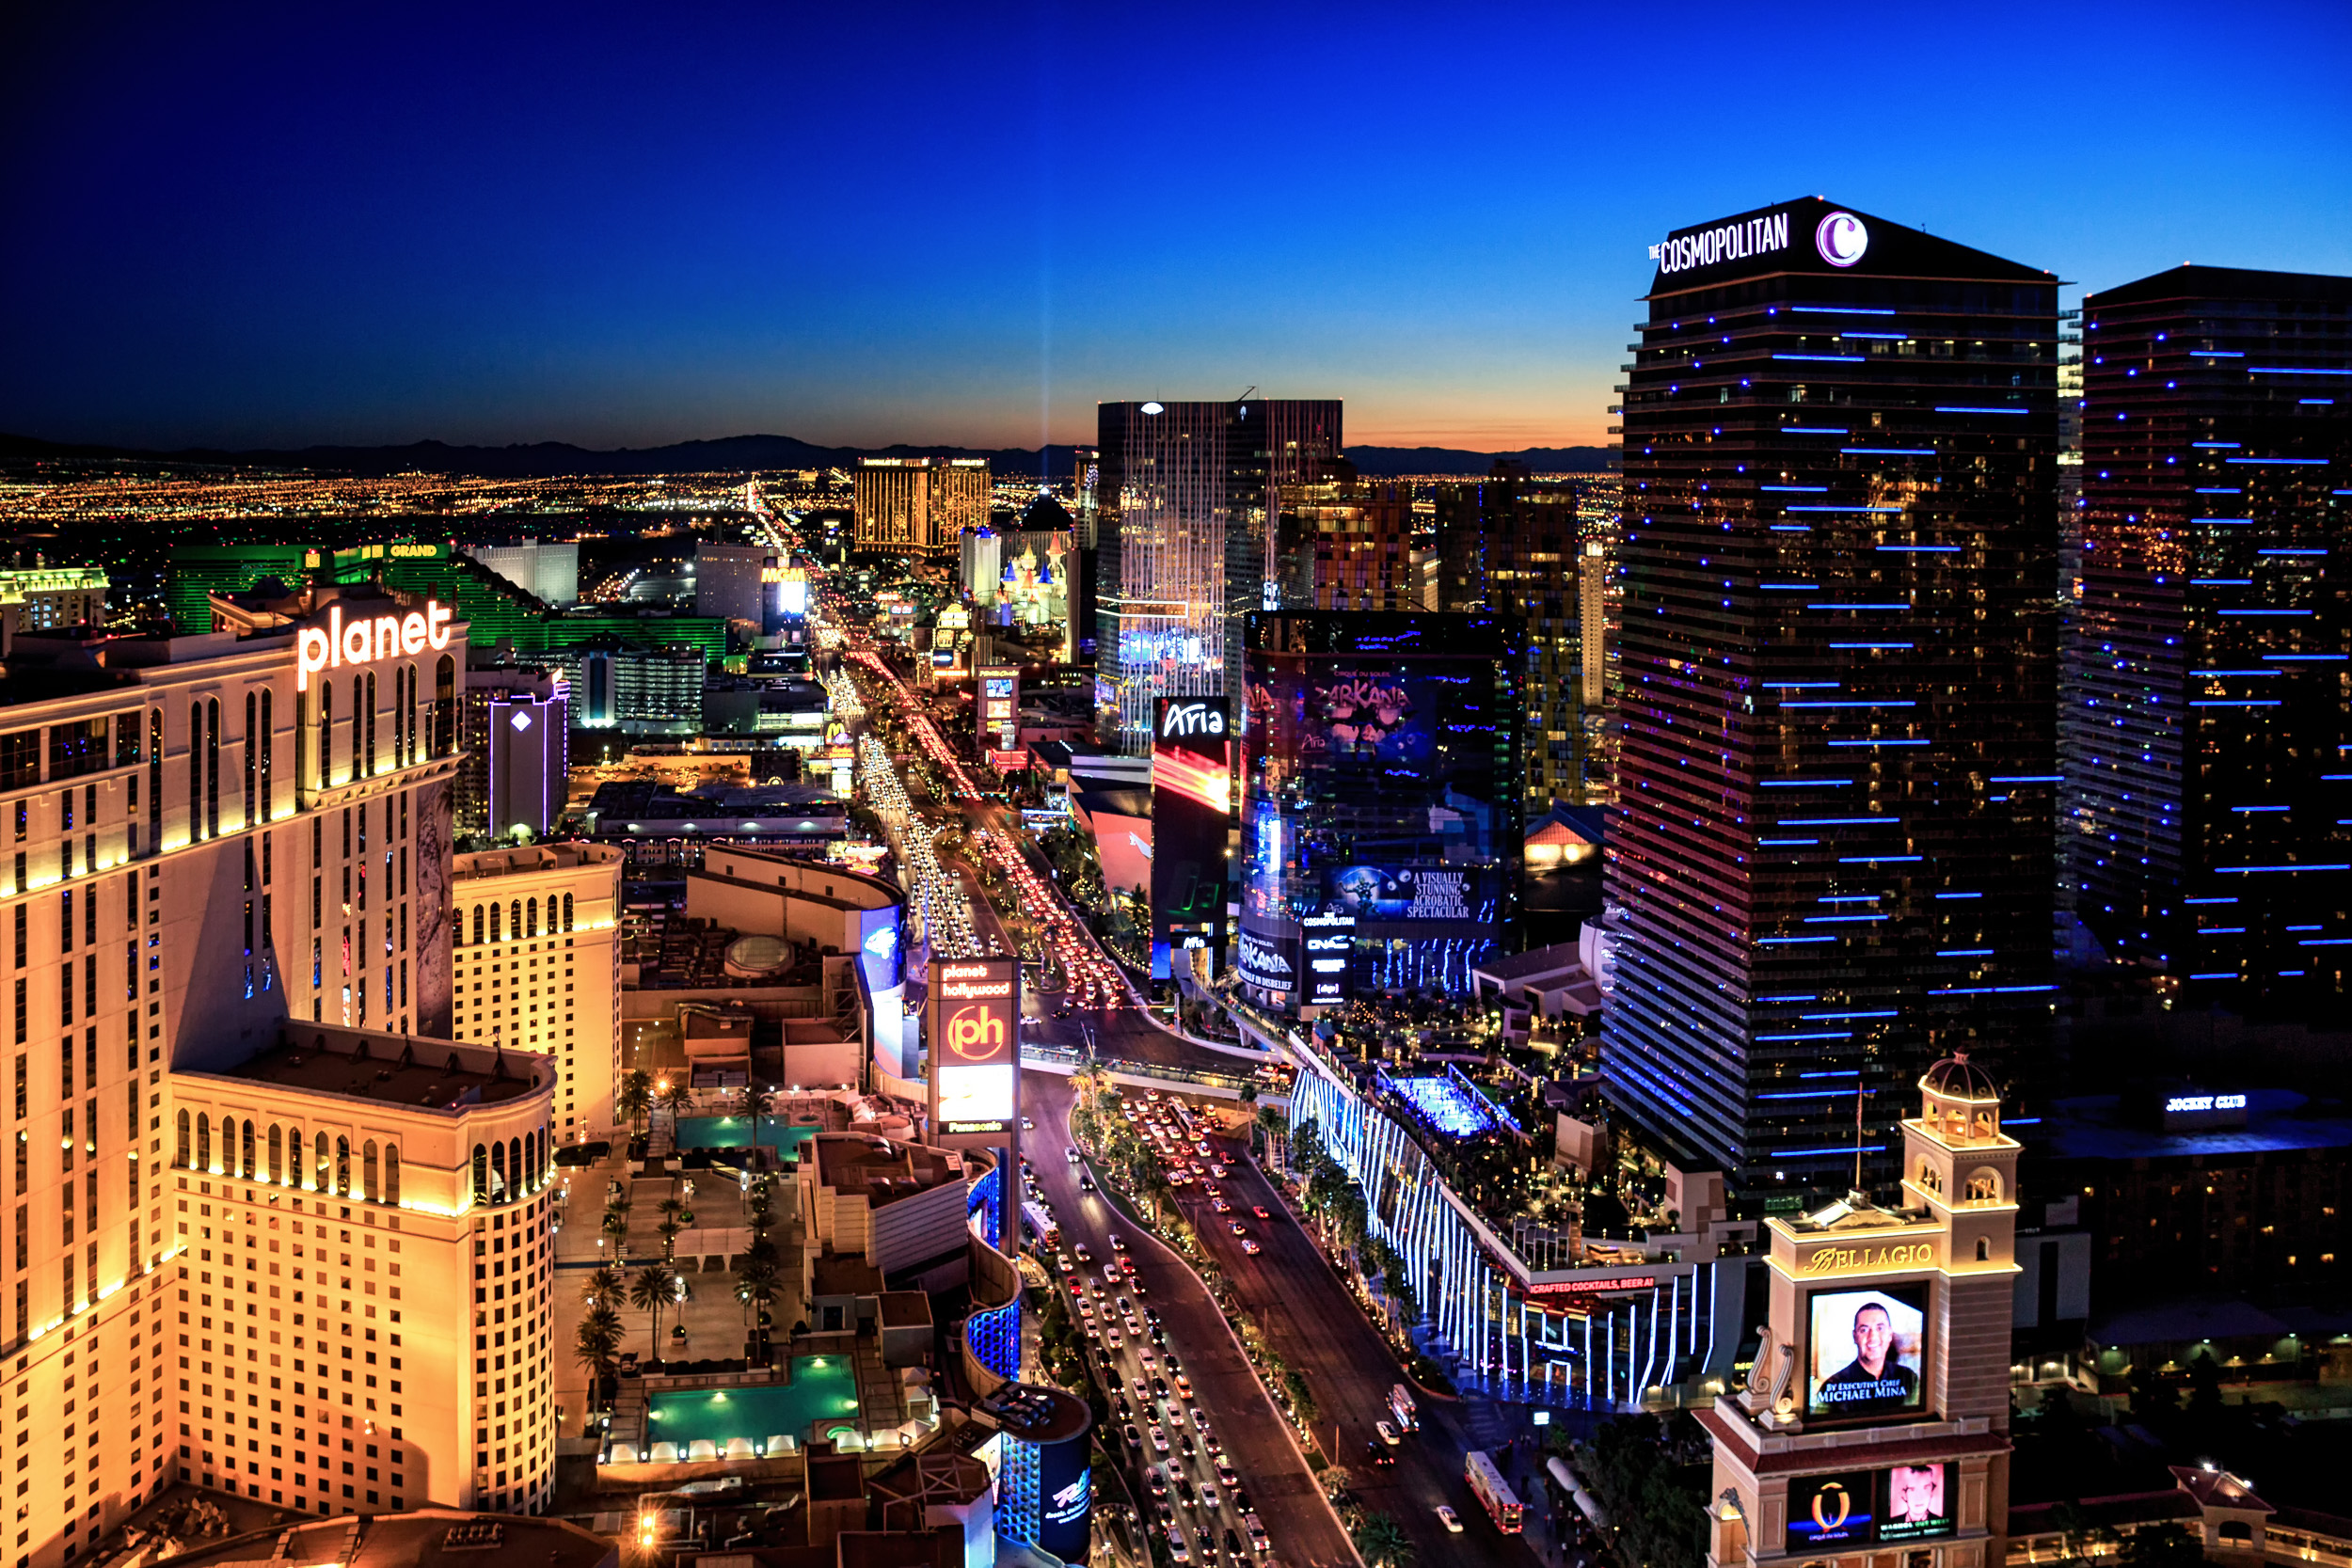 Las_Vegas_Aerial_Miami_Fort_Lauderdale_commercial_photographer_Franklin_Castillo.jpg